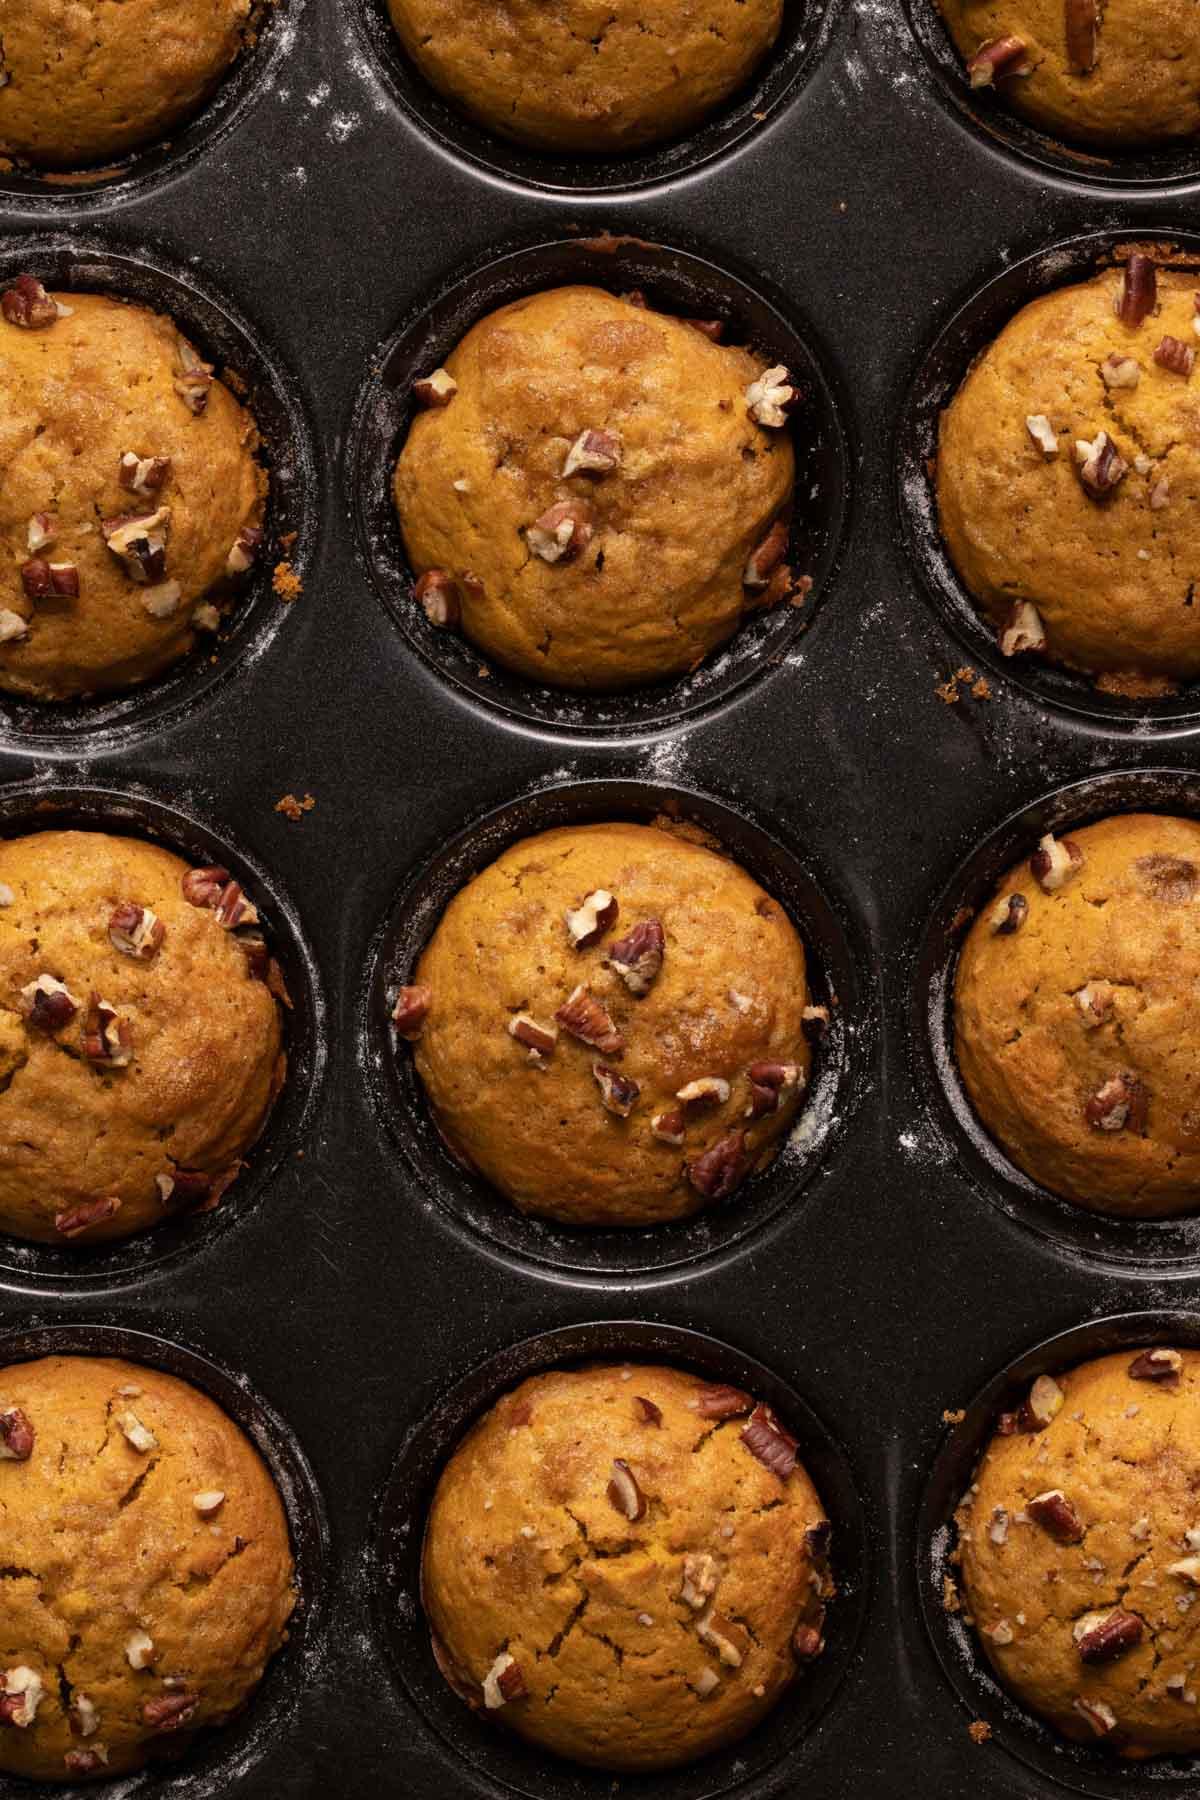 Pumpkin muffins baked in a muffin pan